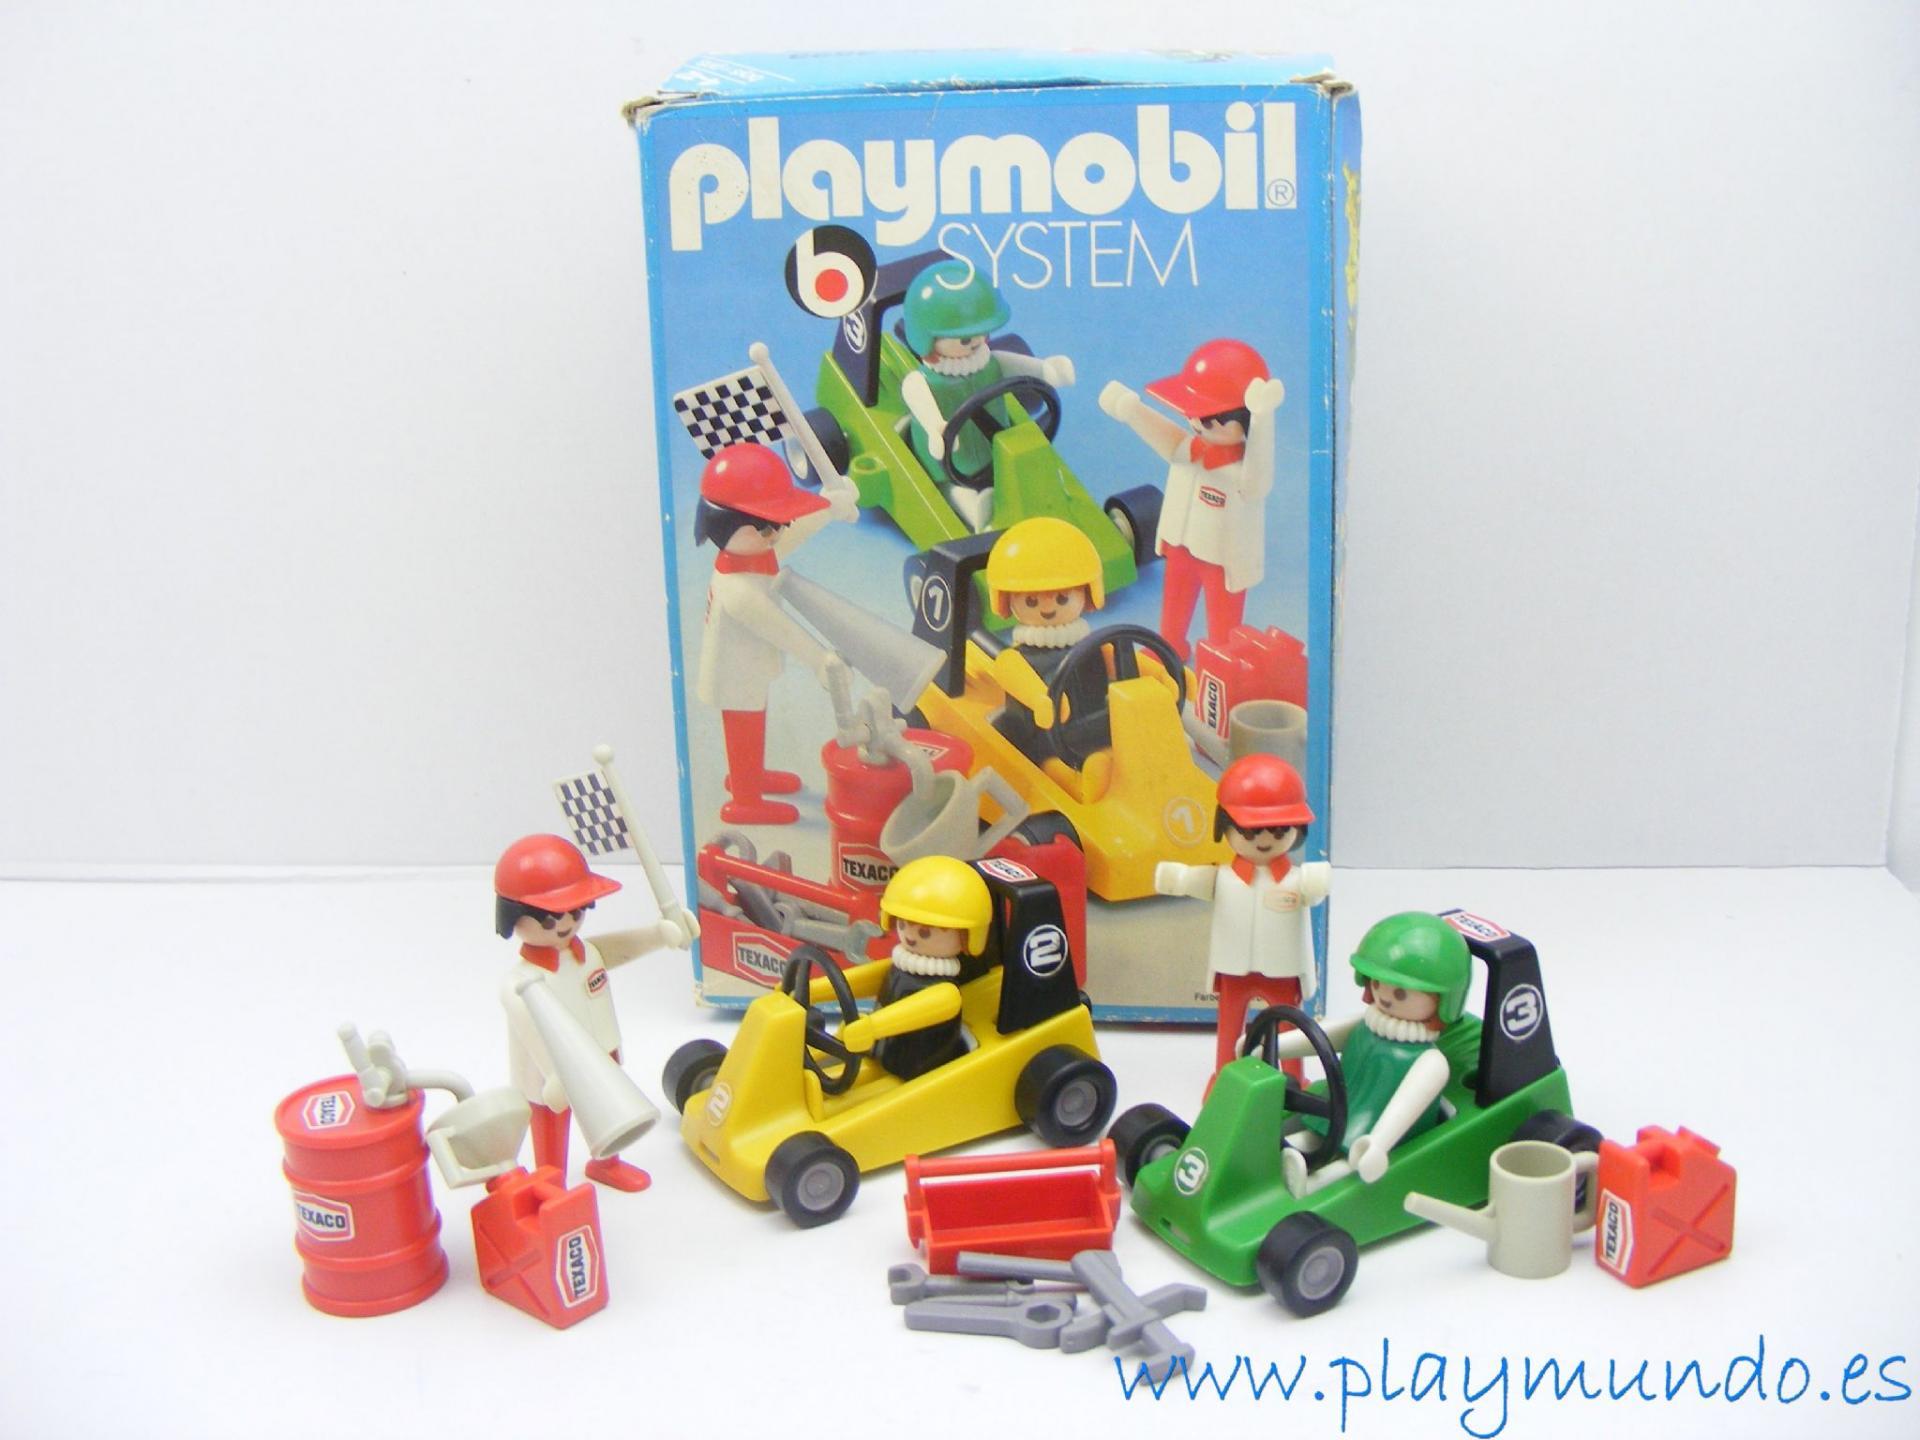 PLAYMOBIL 3523 KART CARRERAS (version 1, AÑO 1979 - 1981)